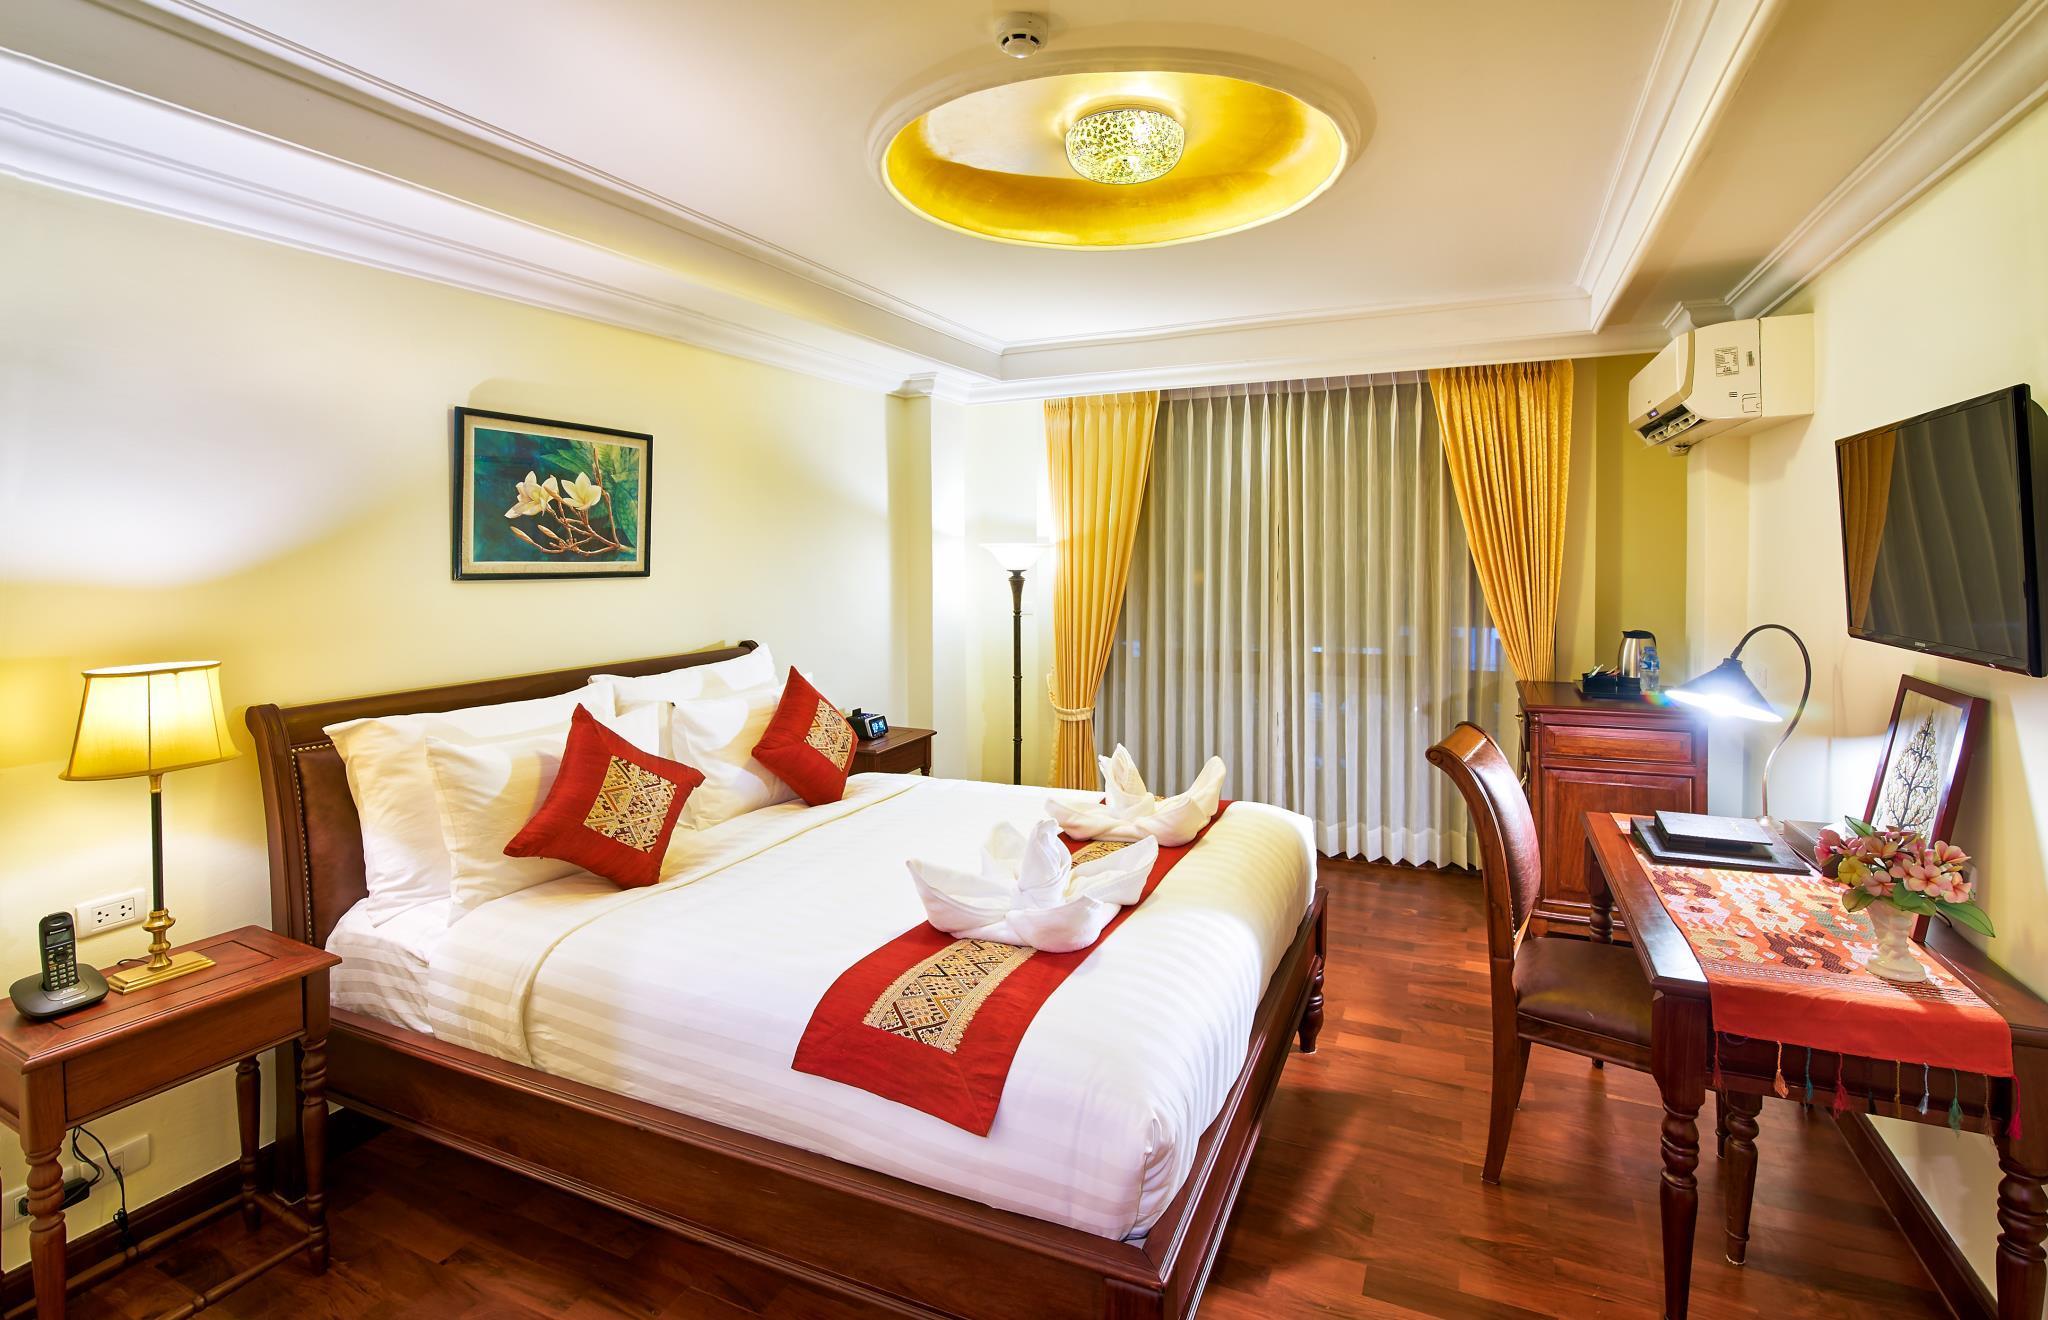 Phasouk Vien Chantra Hotel Vientiane Laos